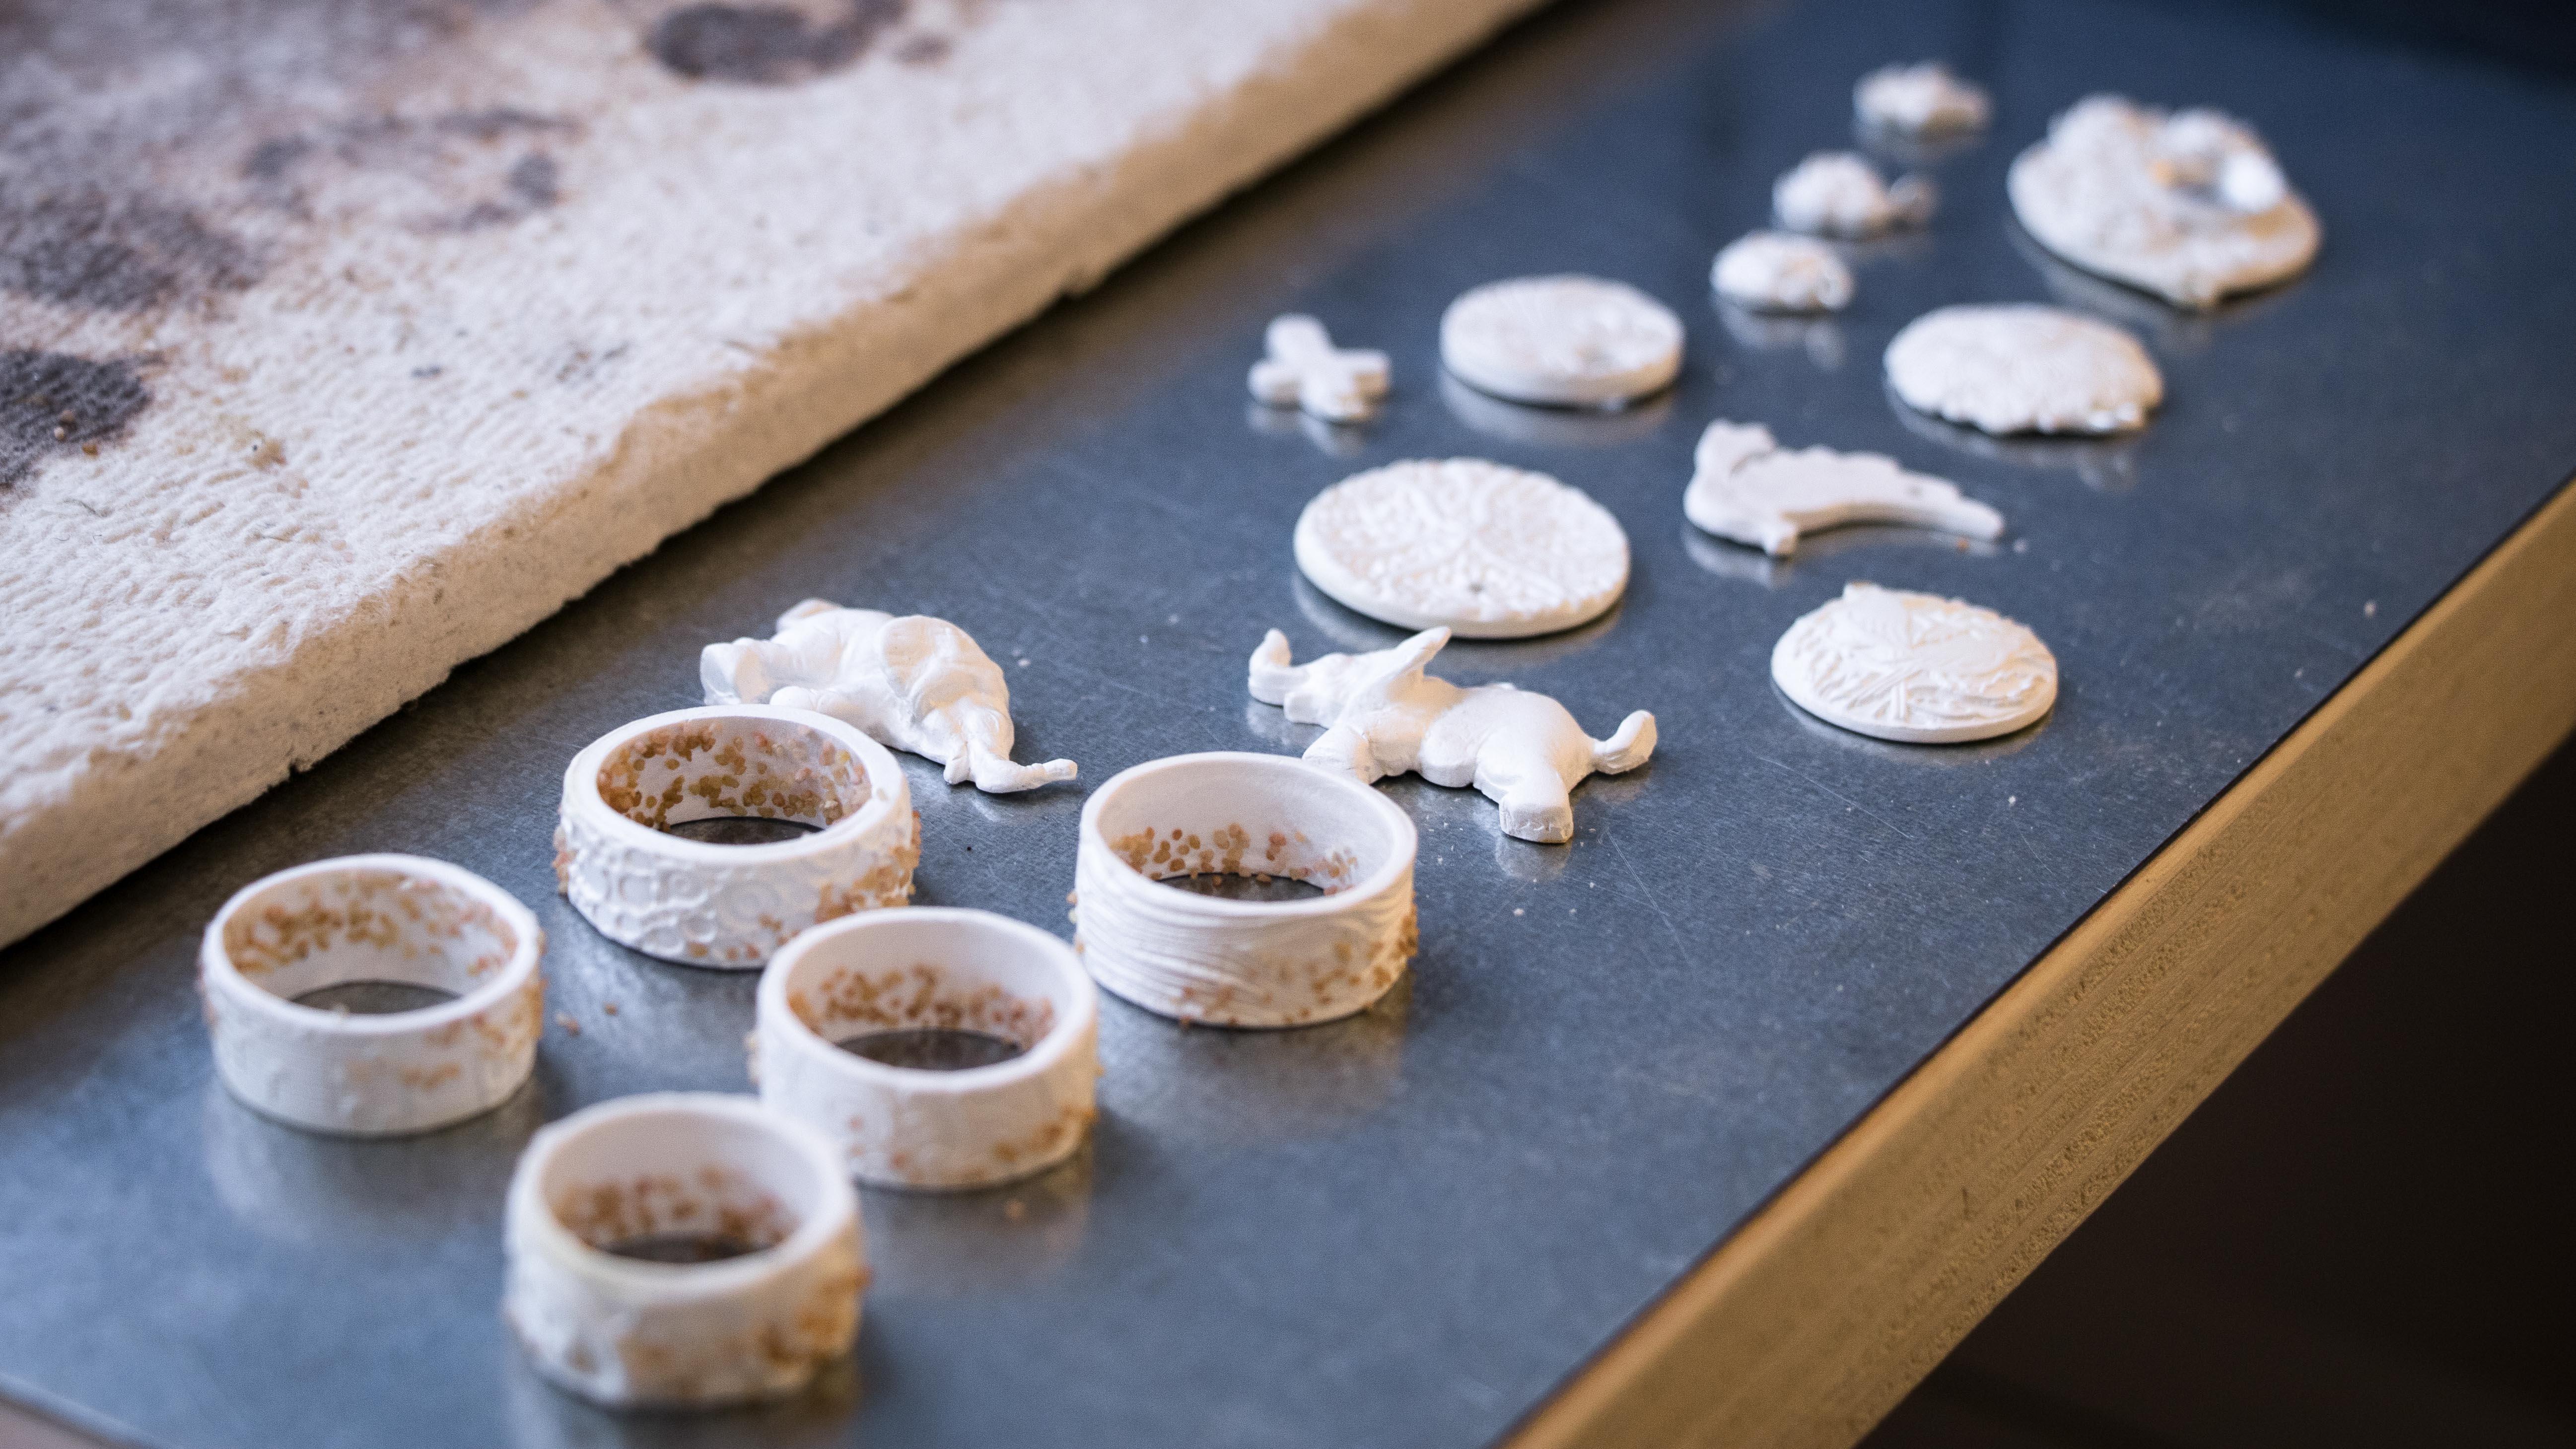 silver clay kurs im atelier himmelsperlen individueller silberschmuck. Black Bedroom Furniture Sets. Home Design Ideas